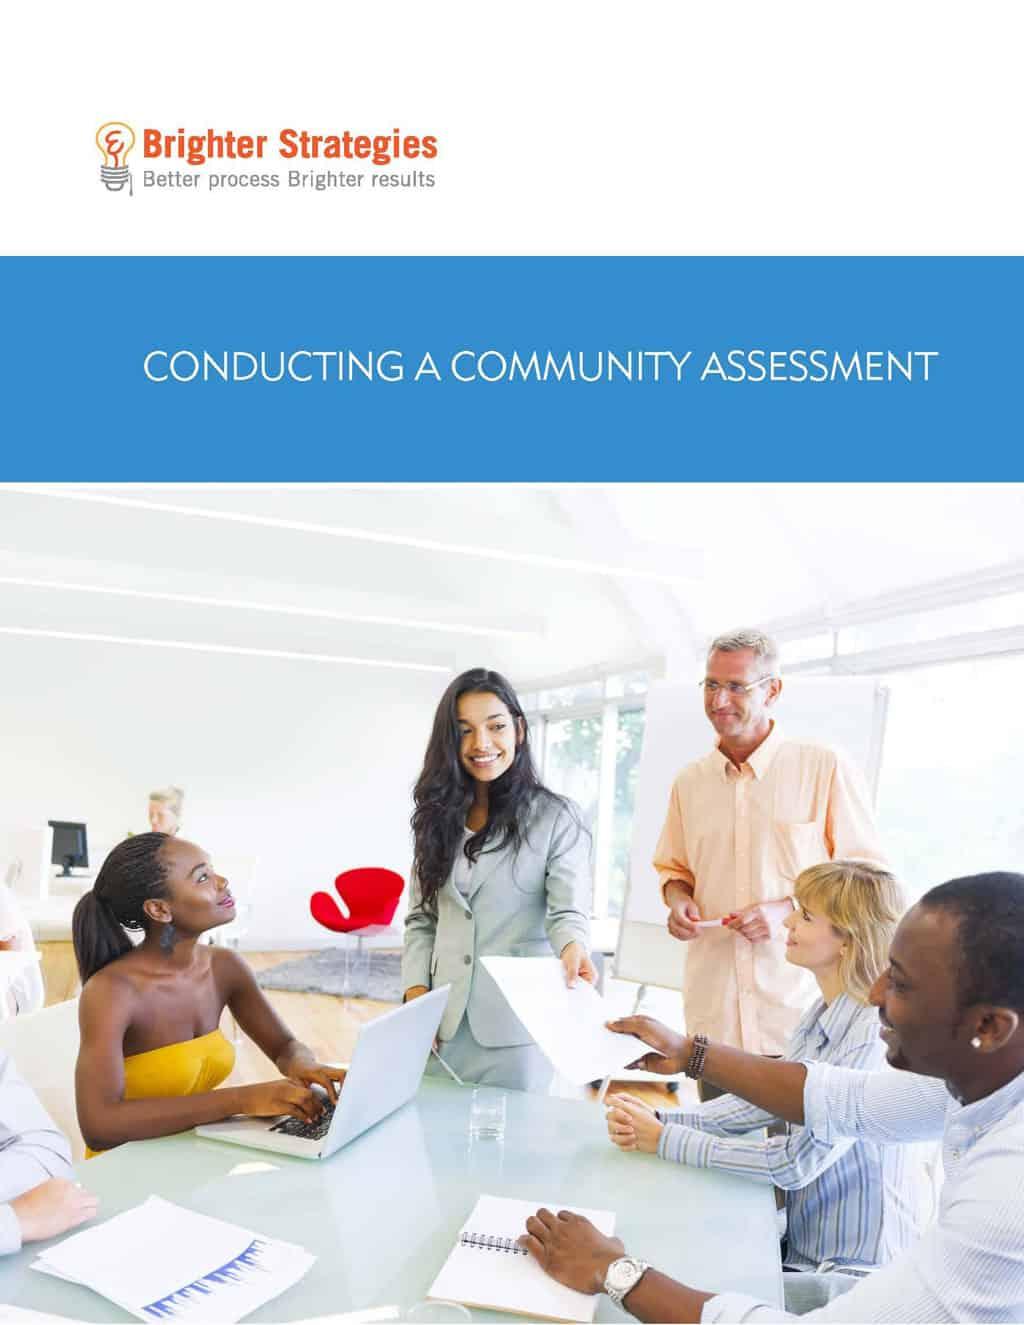 Conducting a Community Assessment ebook